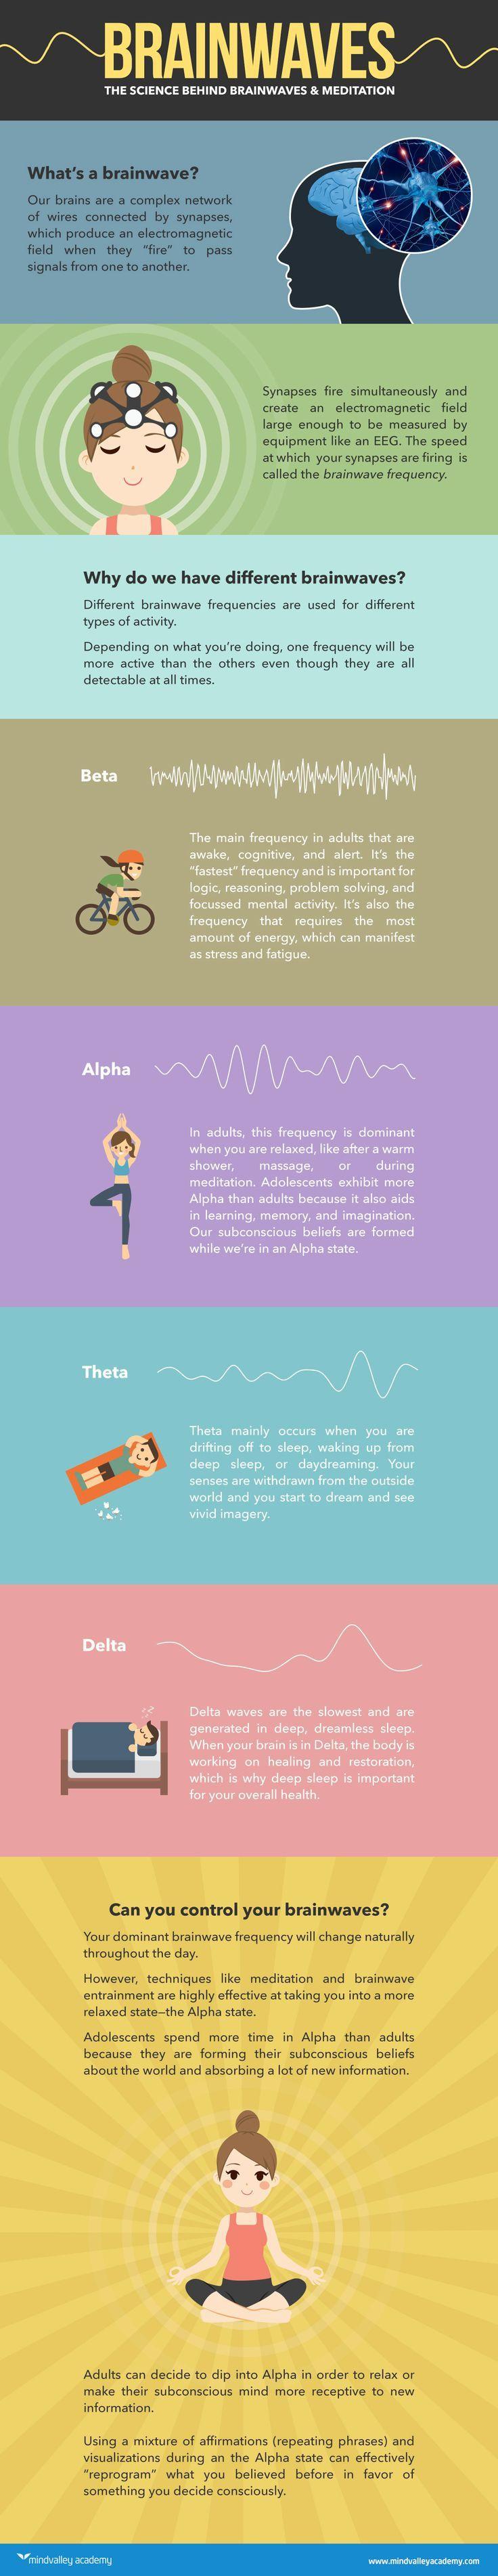 473 best Brain Train images on Pinterest   Nervous system, The brain ...